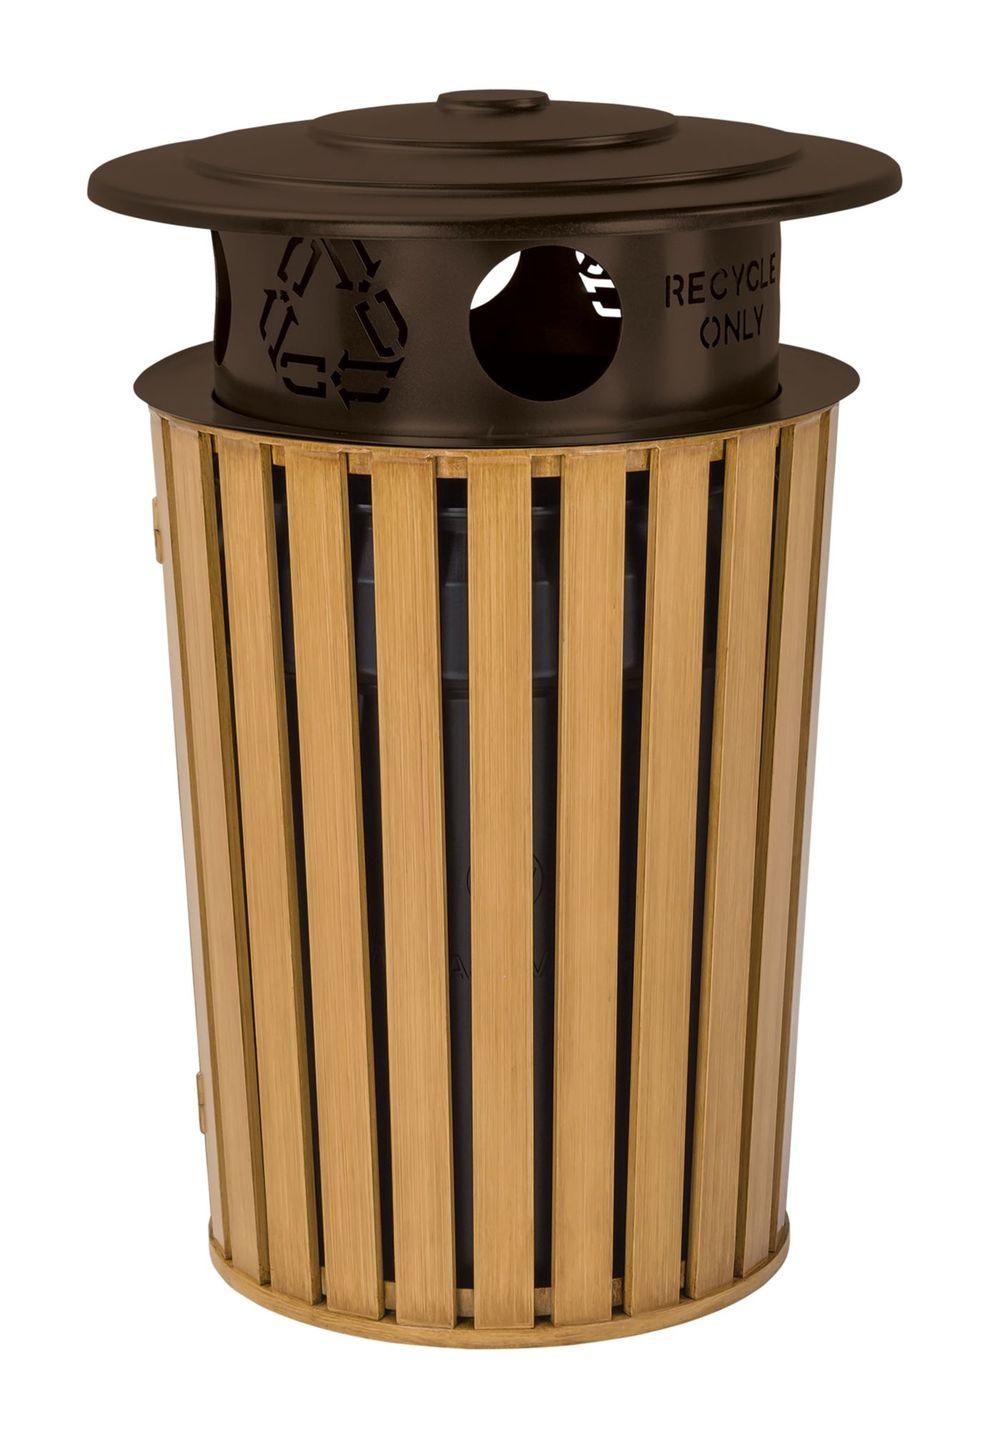 Tropitone Furniture - District Round Waste Receptacle